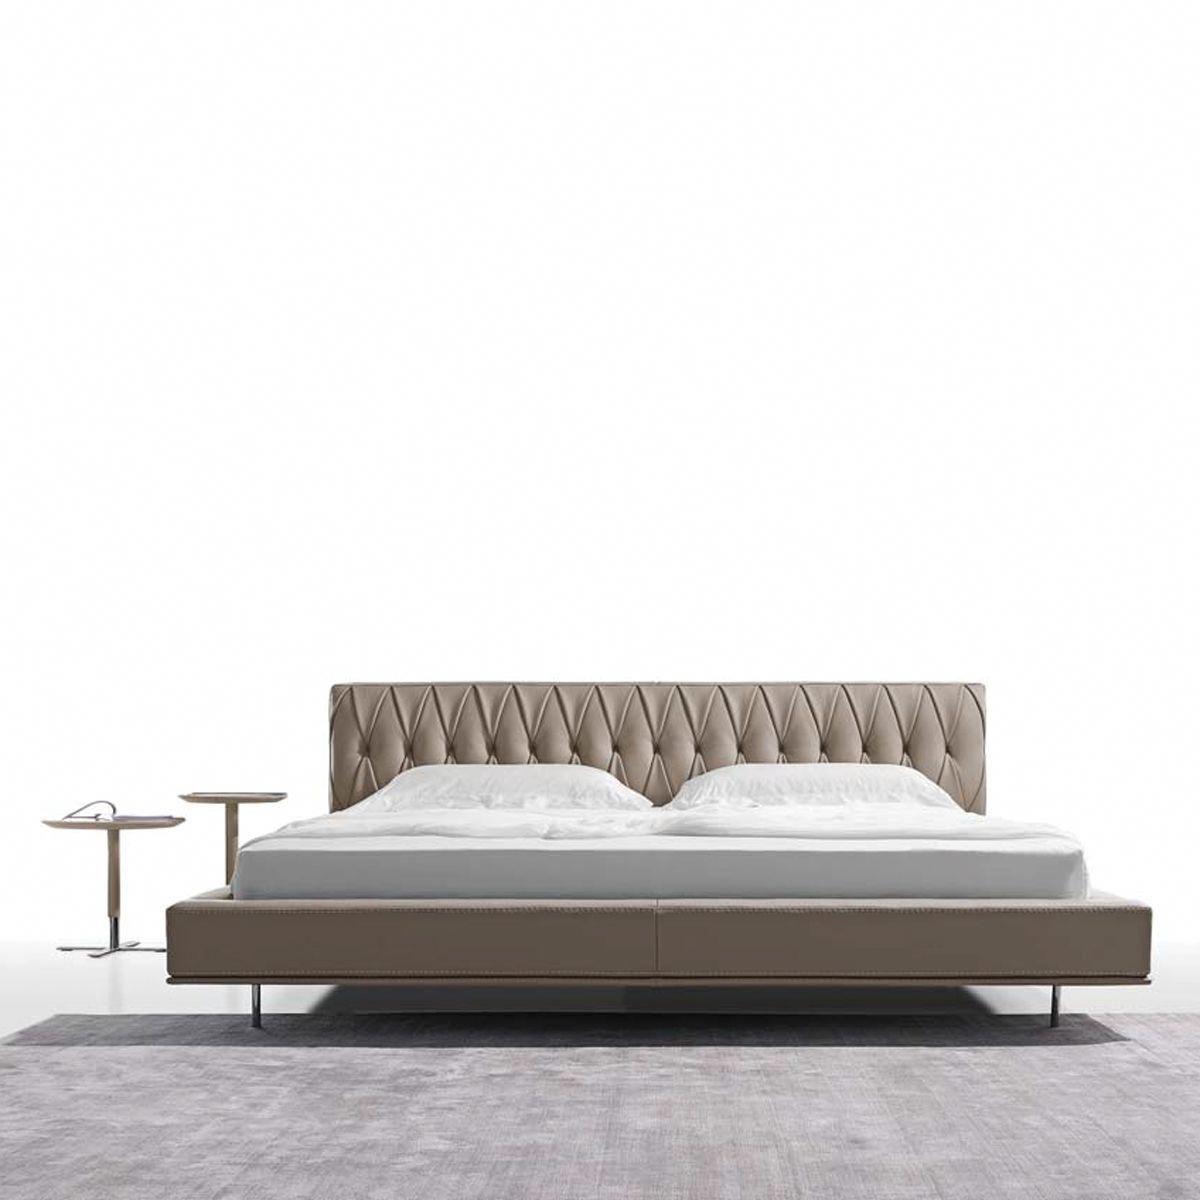 Mcqueen Night Design Depot Furniture Furniture Miami Showroom With Images